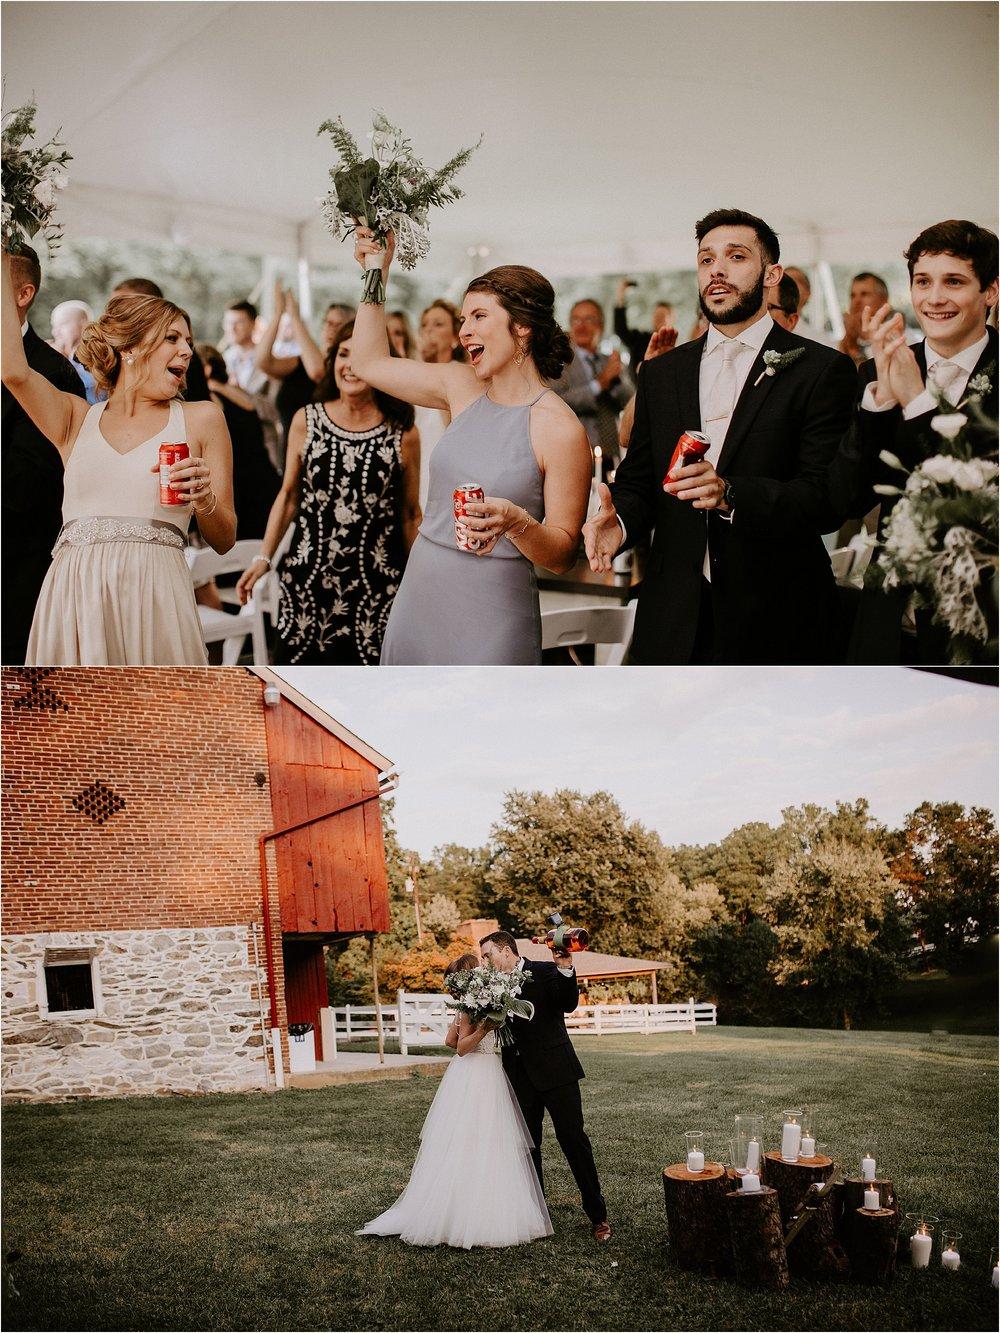 Sarah_Brookhart_Lancaster_Wedding_Photographer_0067.jpg